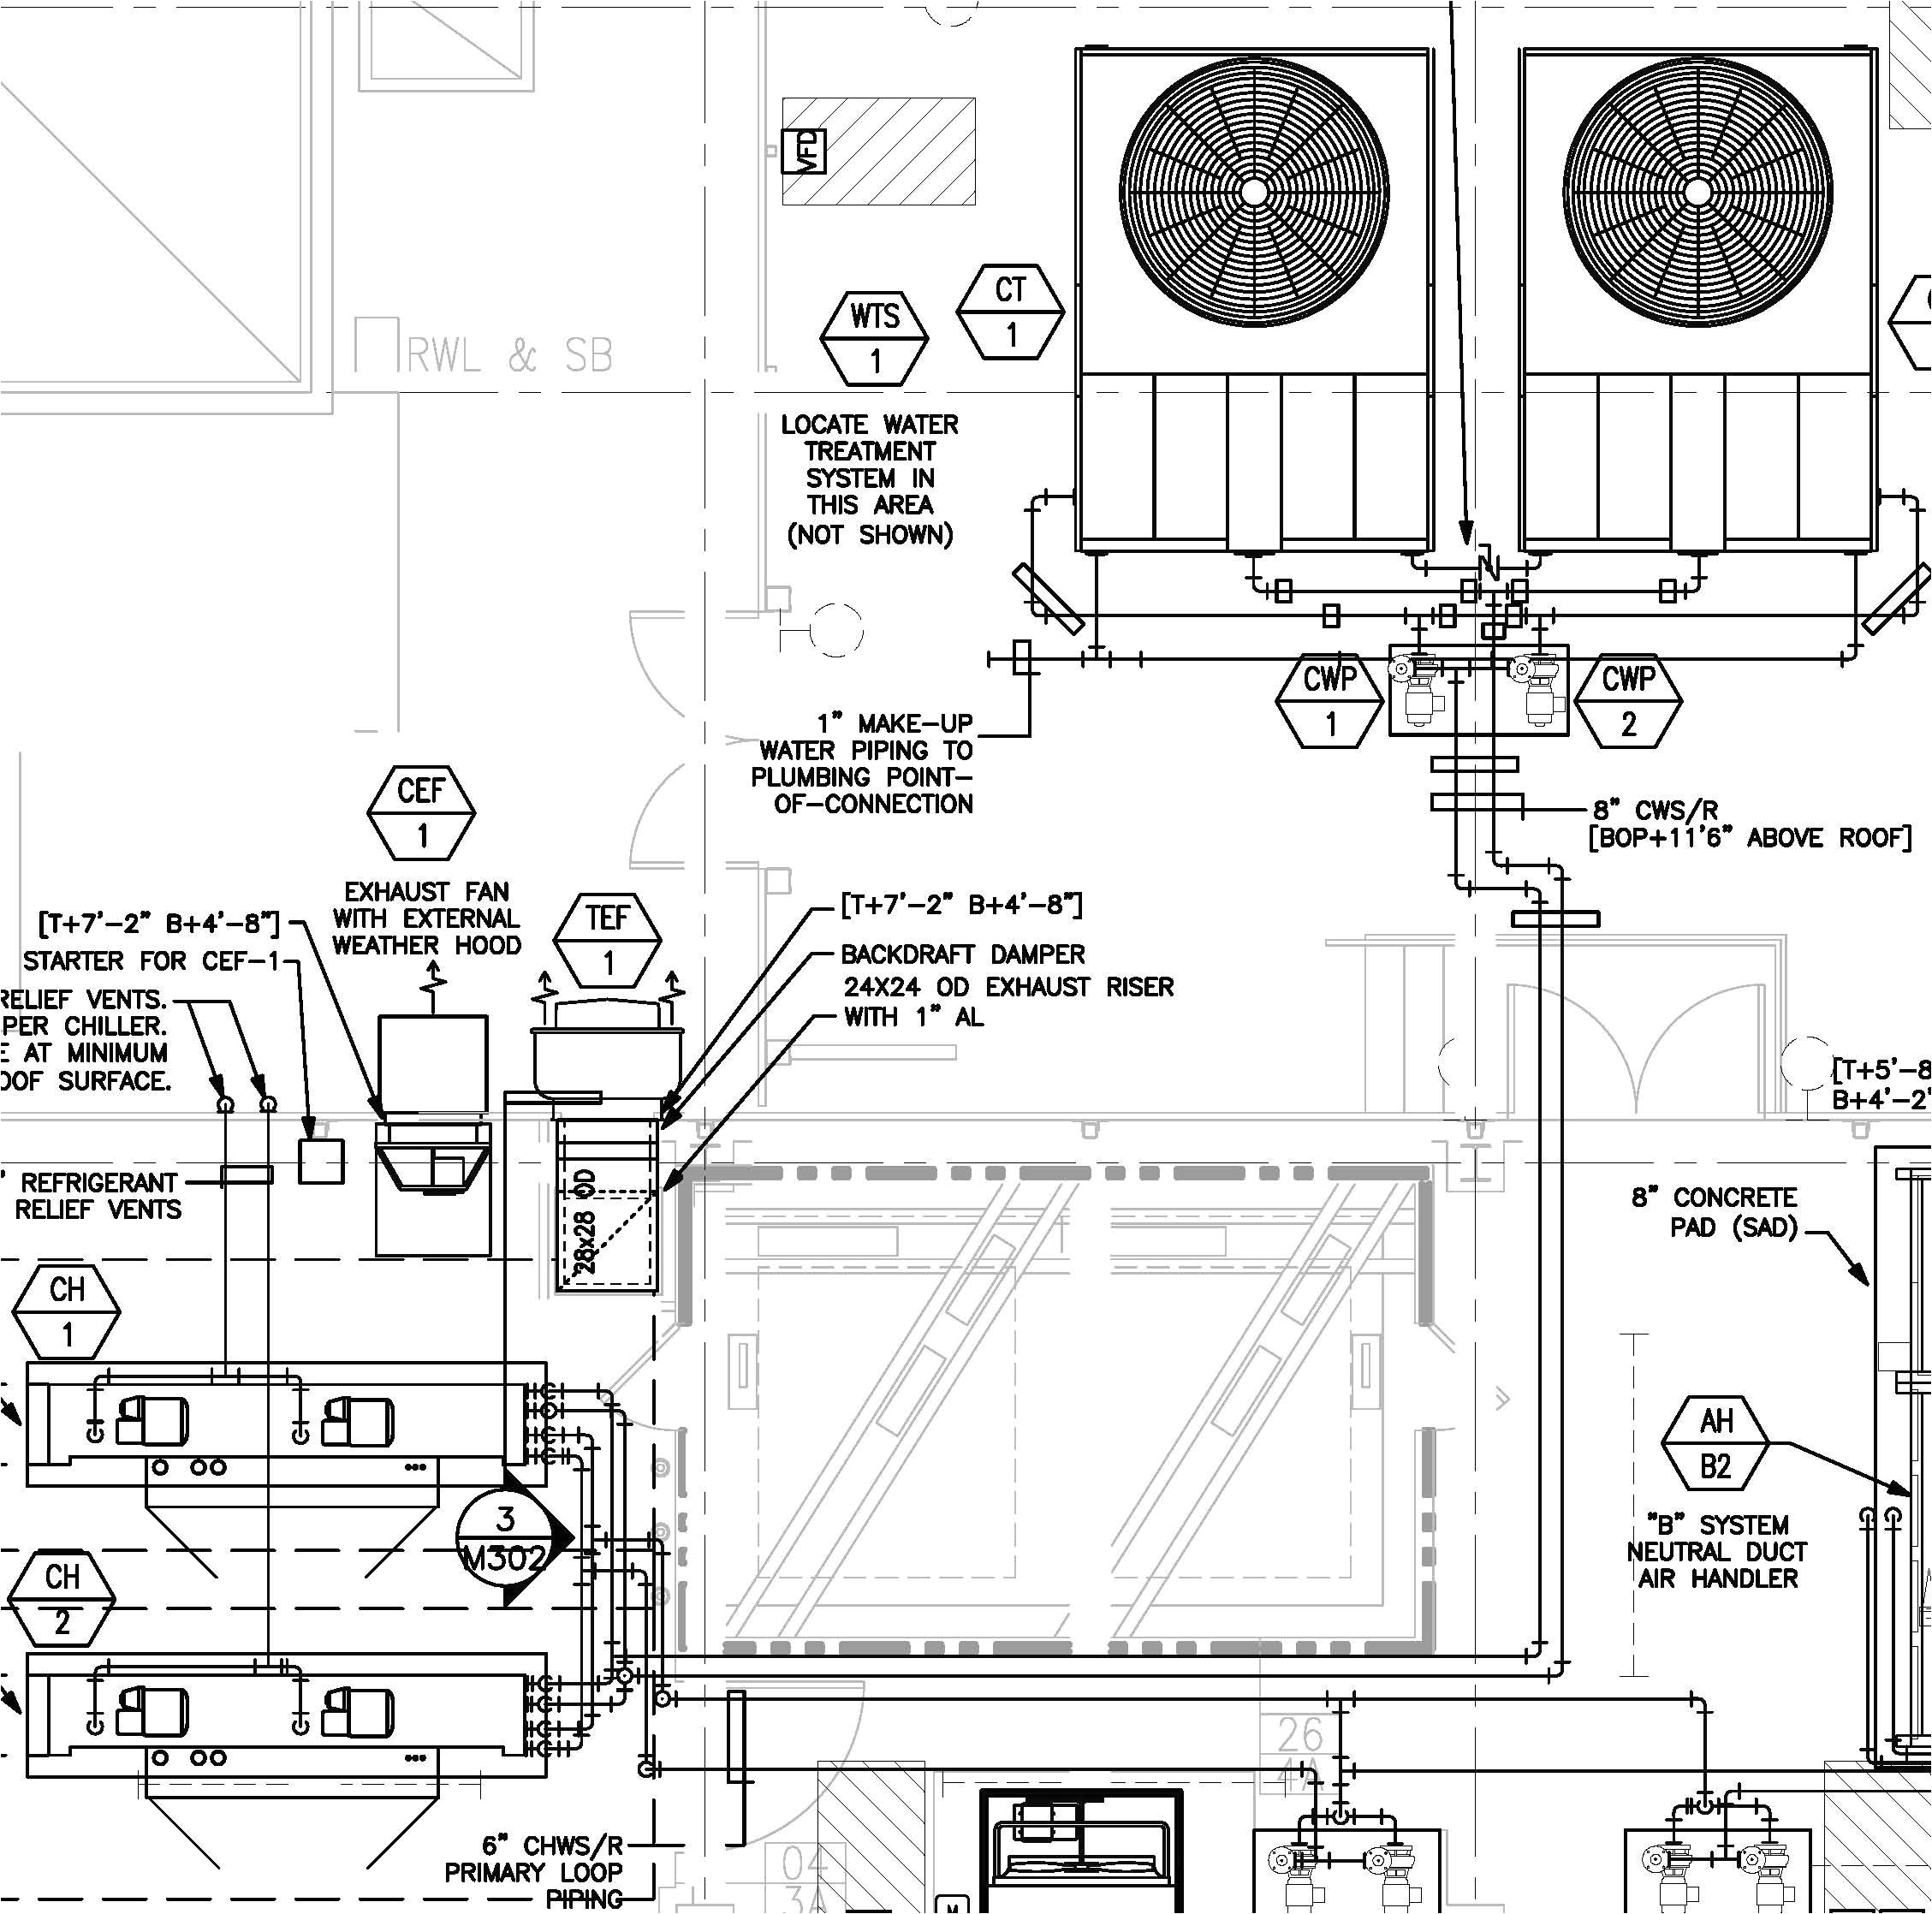 gvd 6 wiring diagram